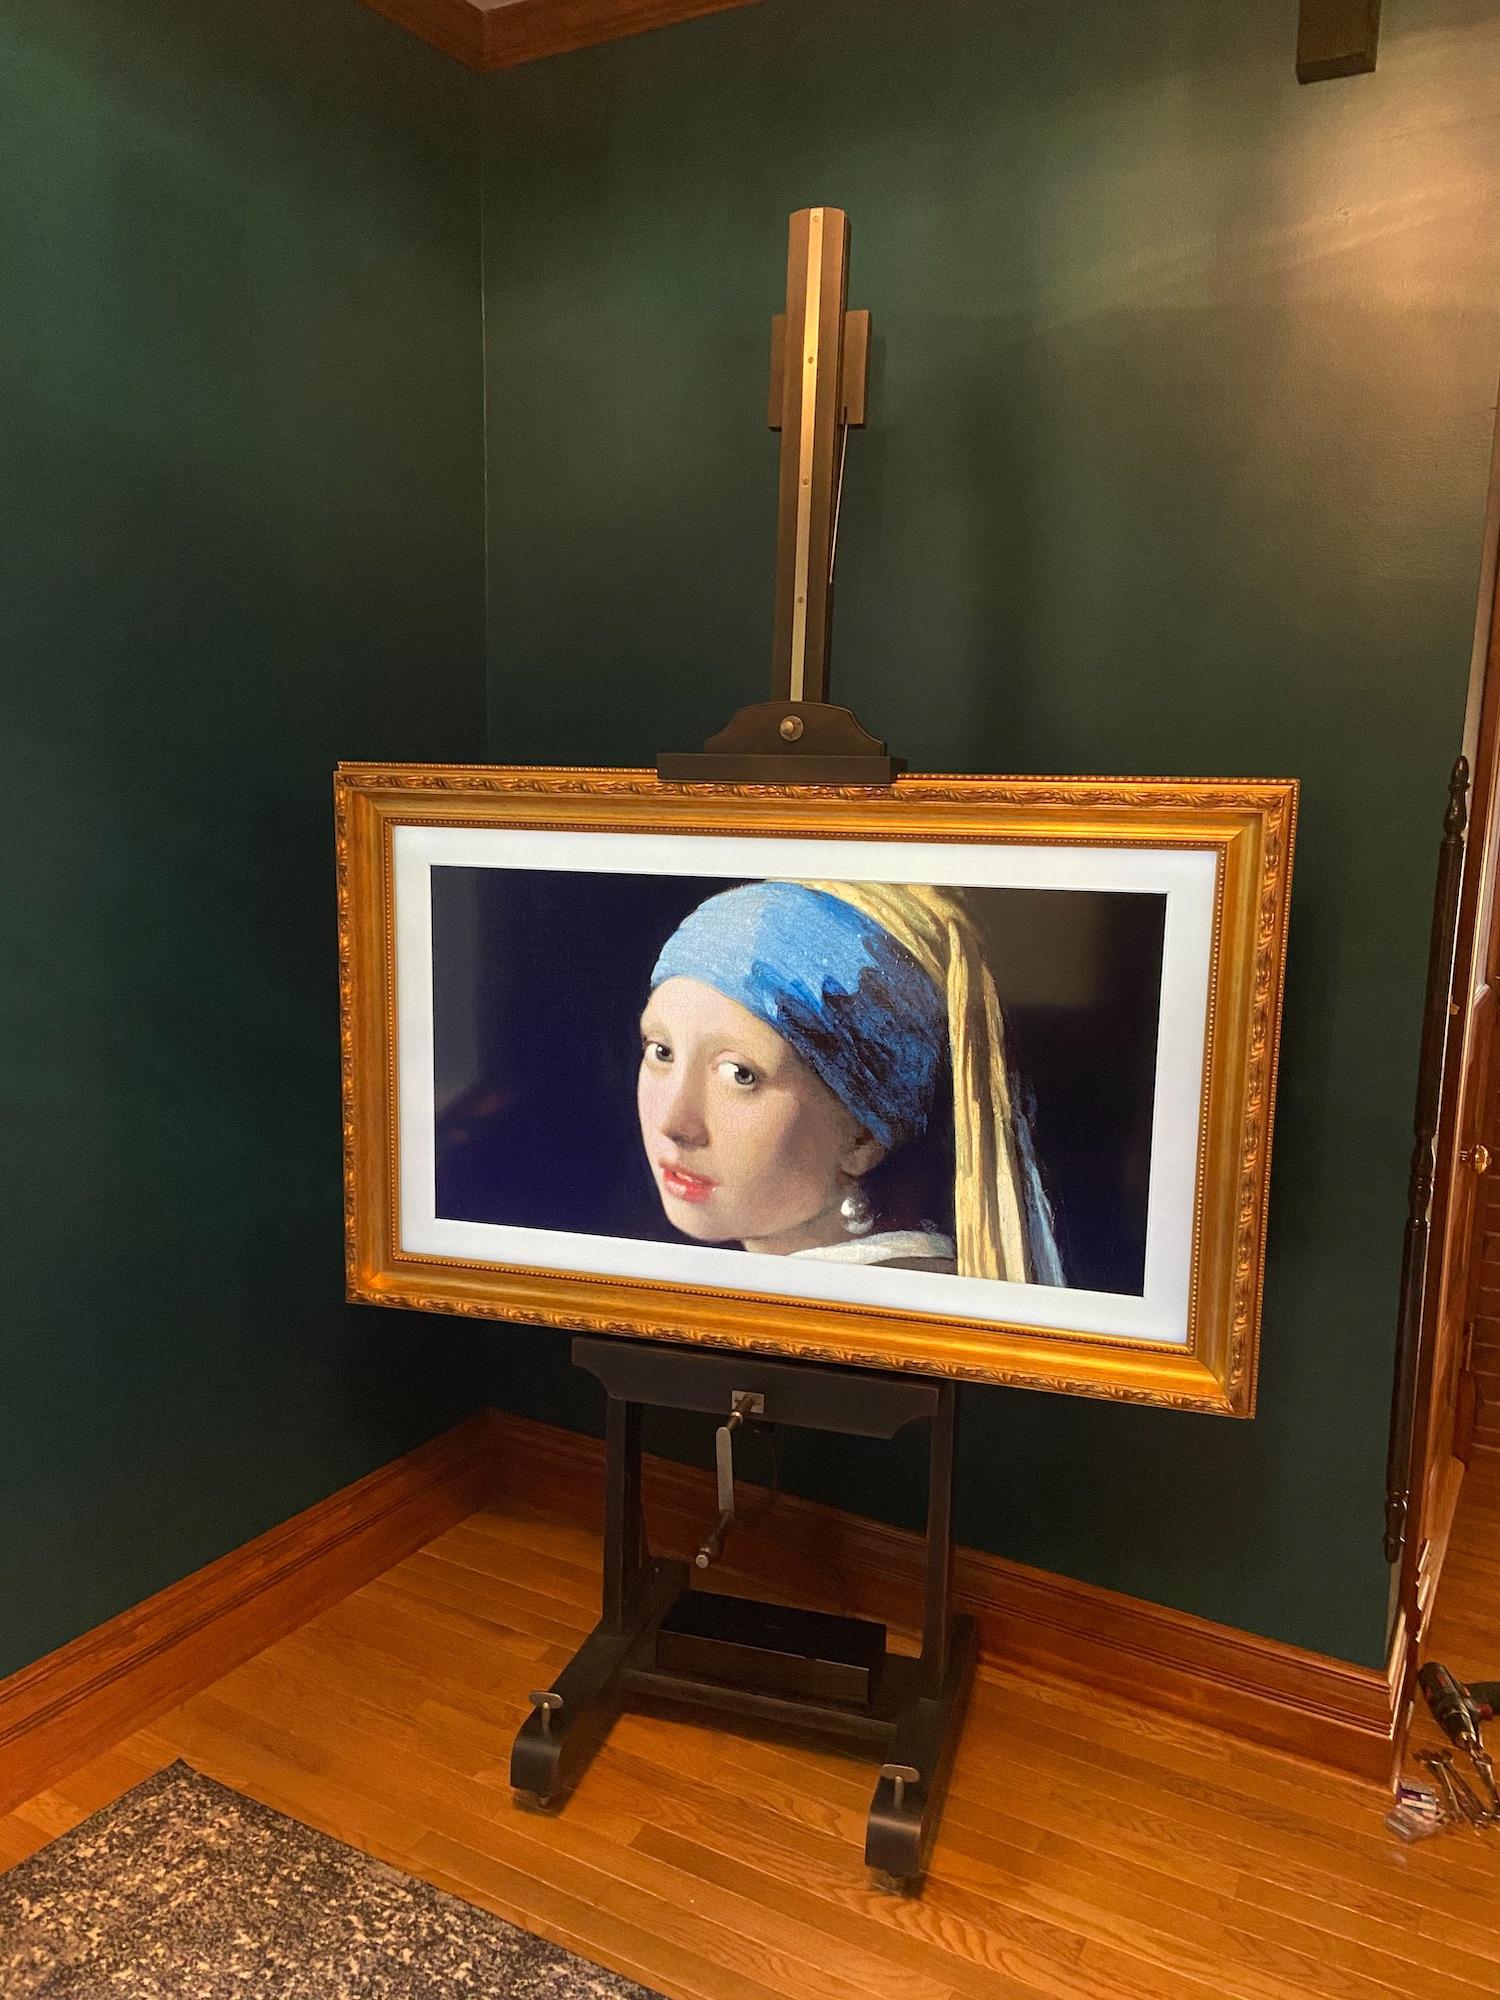 Restoration hardware RH English Artist's TV Easel - Samsung Frame - Studio Stand